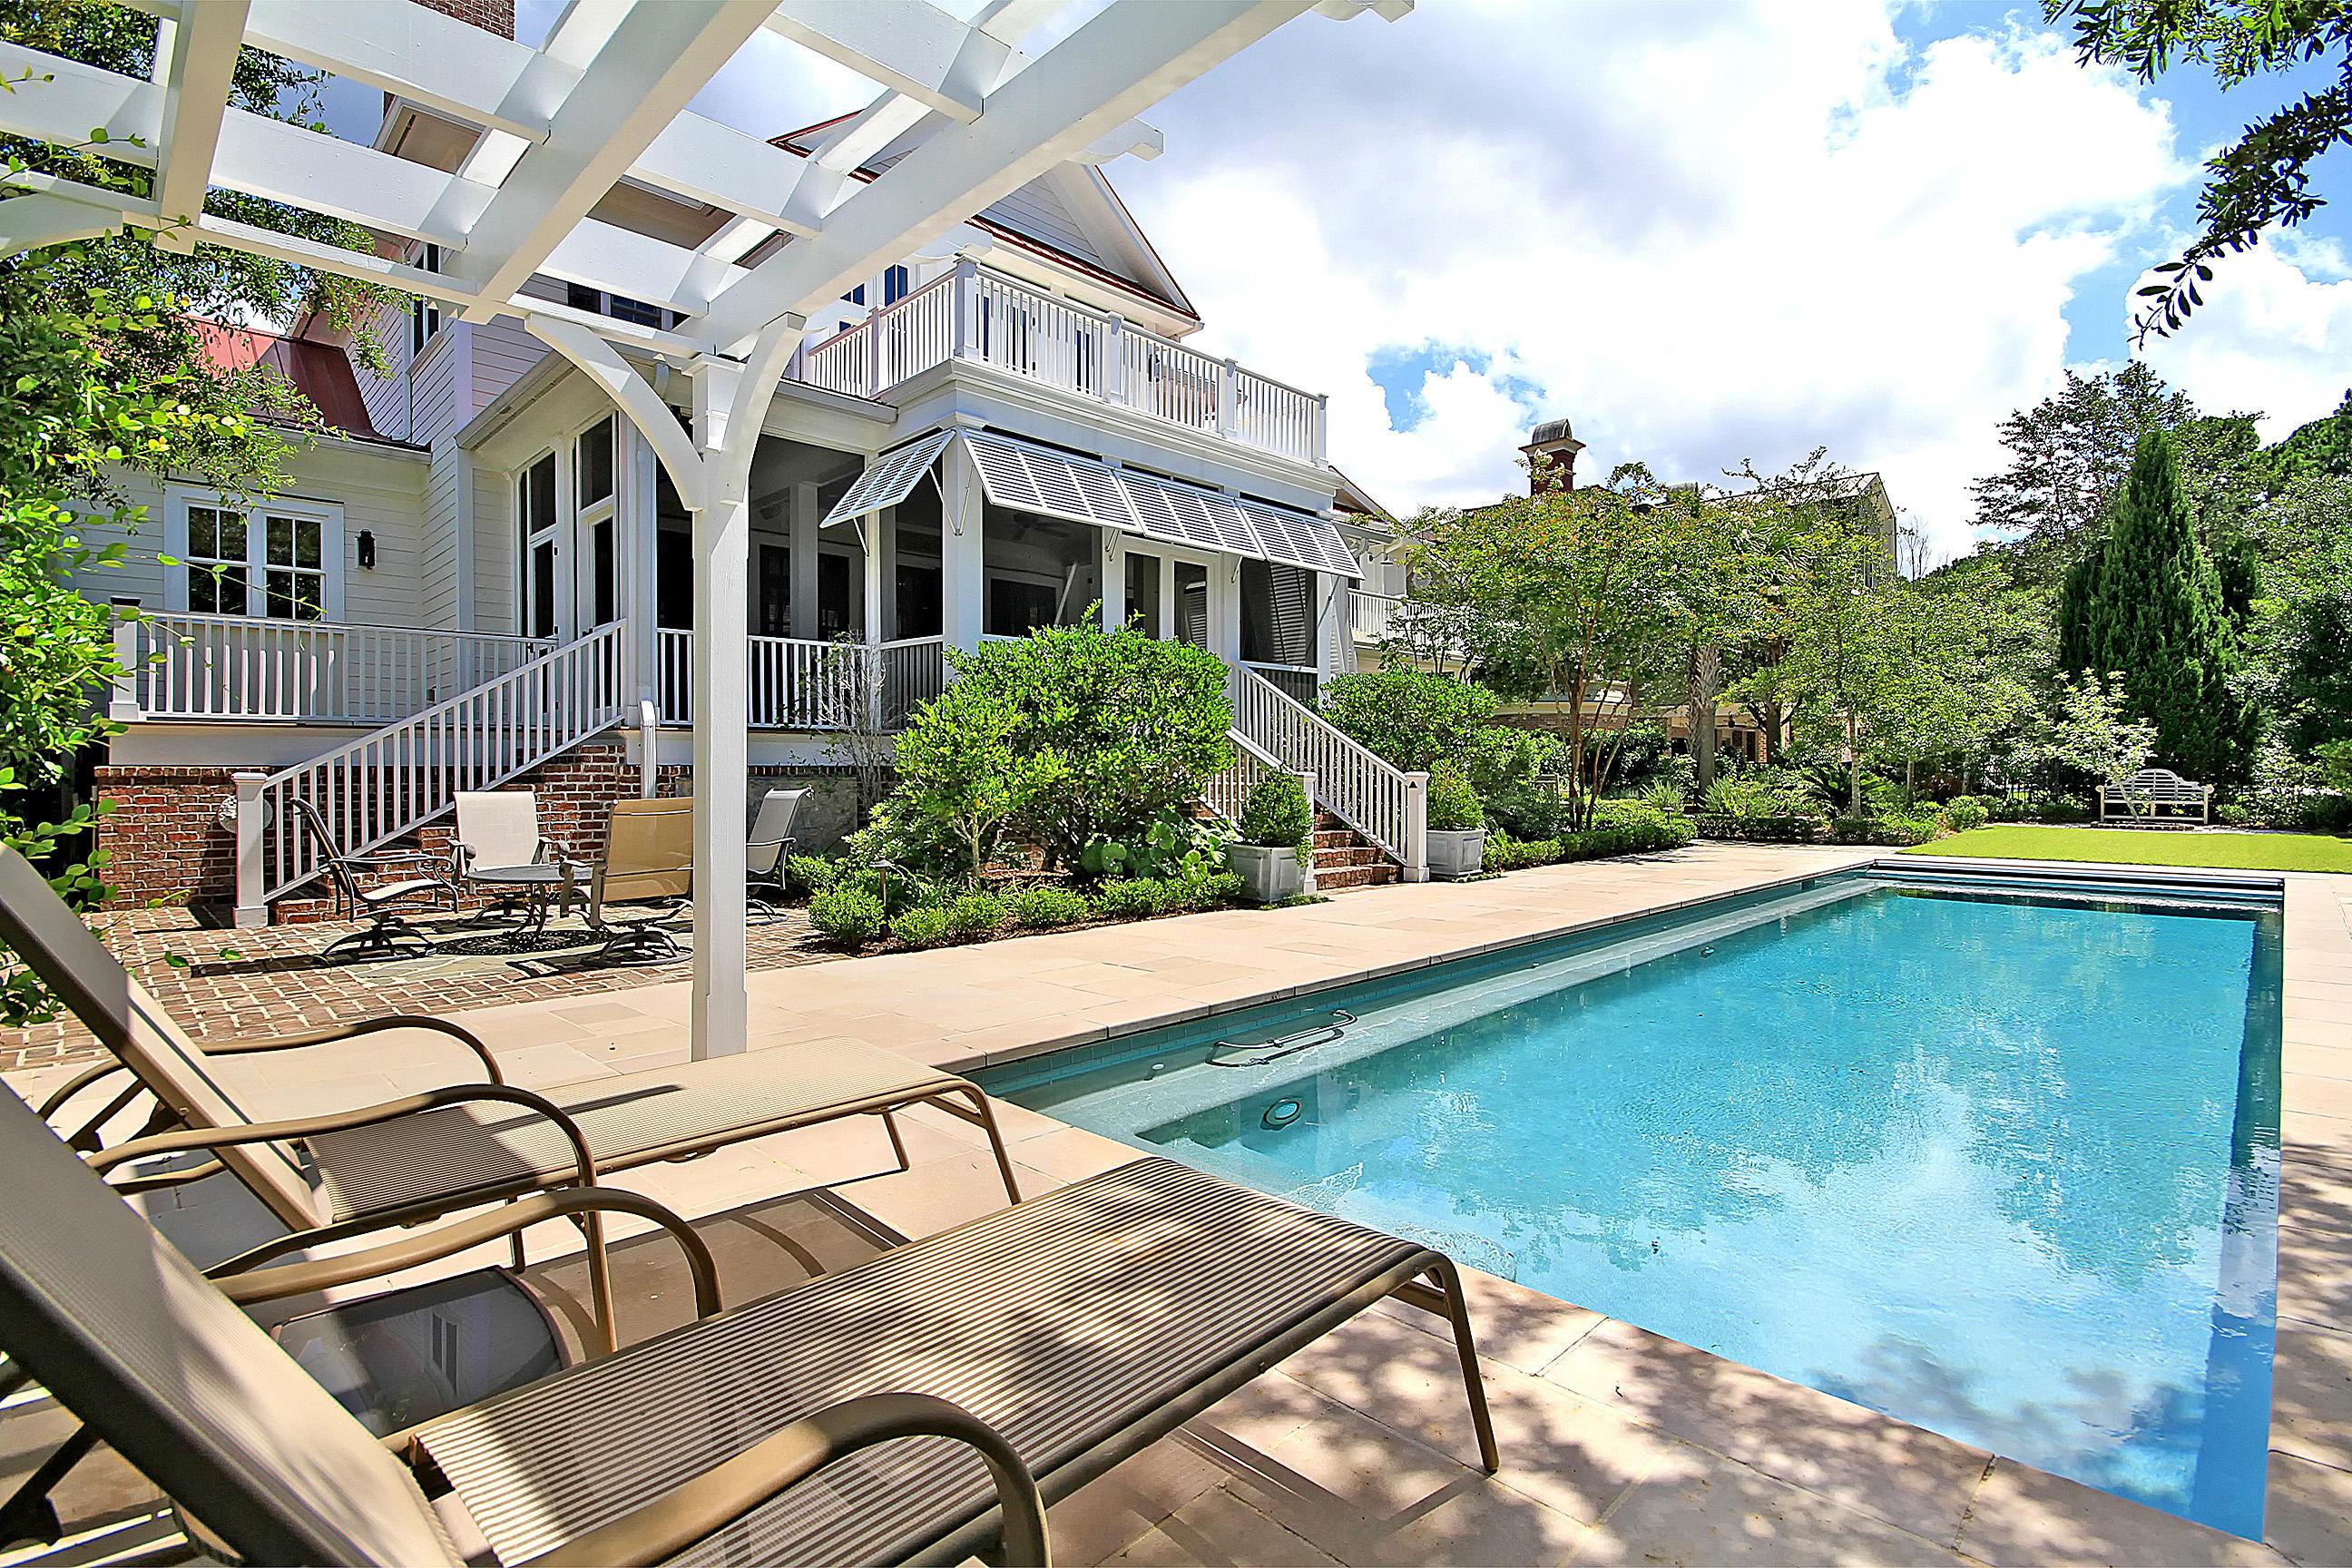 Daniel Island Homes For Sale - 520 Island Park, Daniel Island, SC - 7